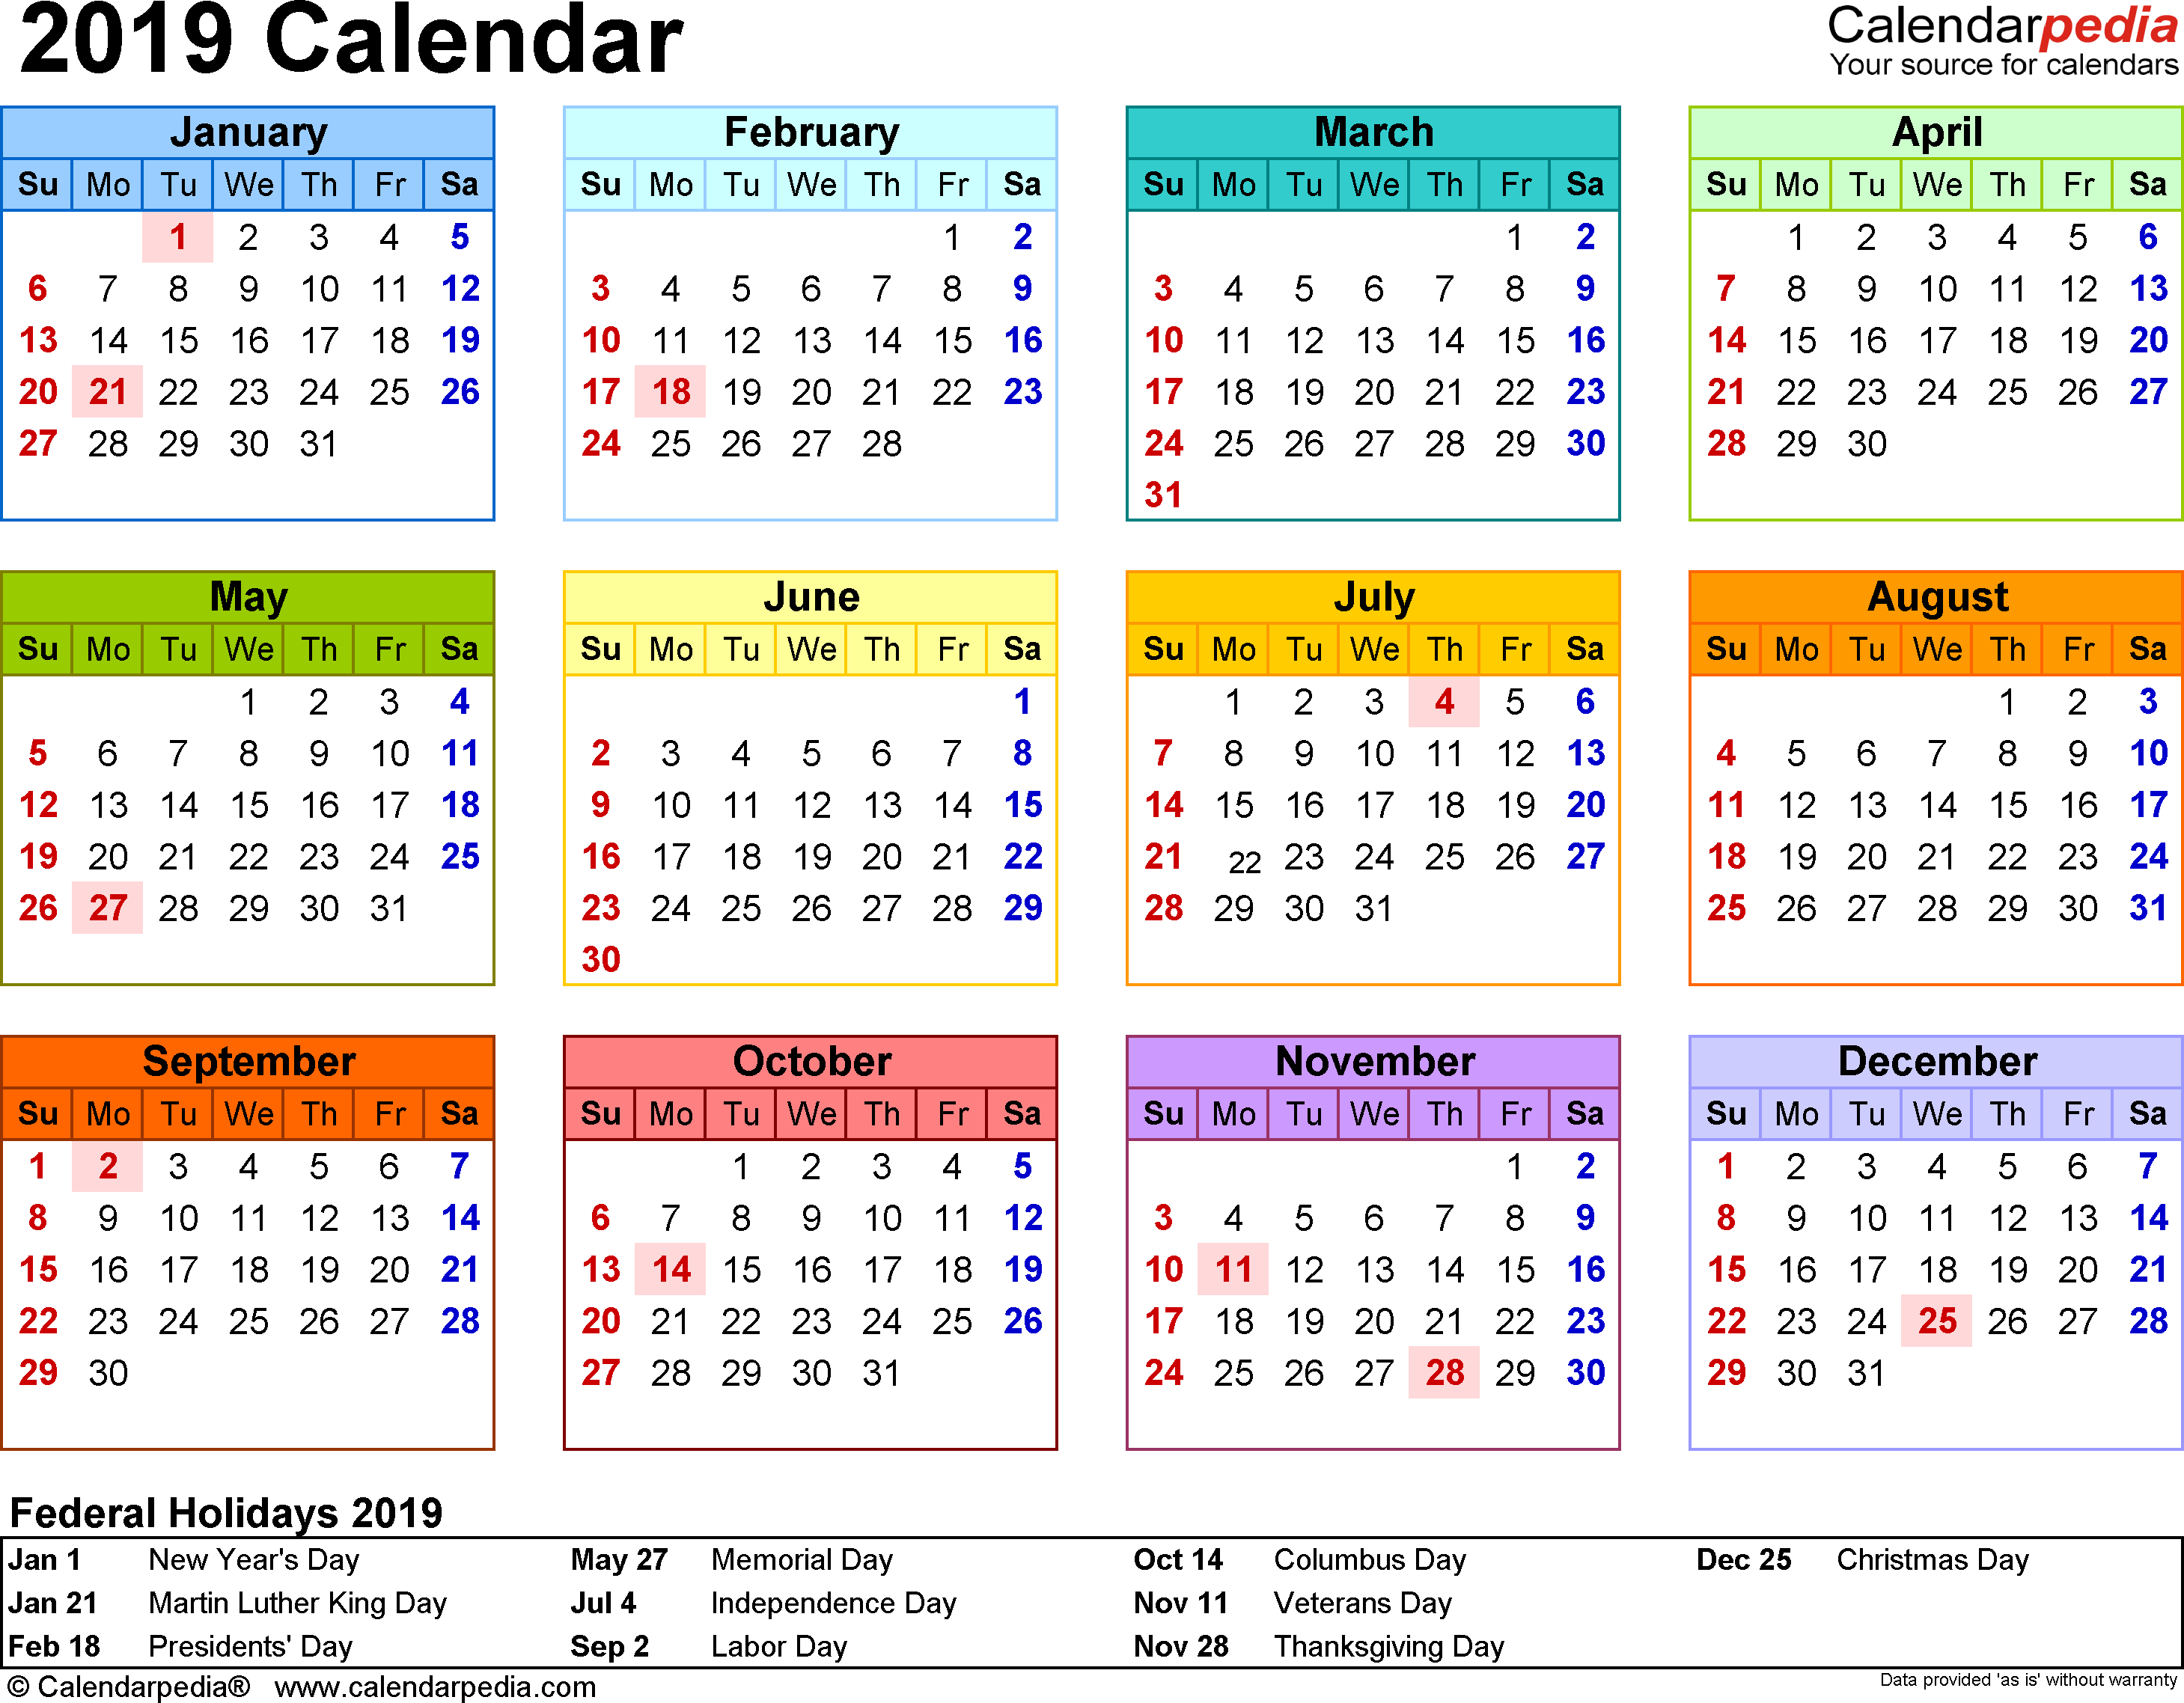 2019 Calendar Pdf - 17 Free Printable Calendar Templates within Free Monthly Calendar Templates 4X6